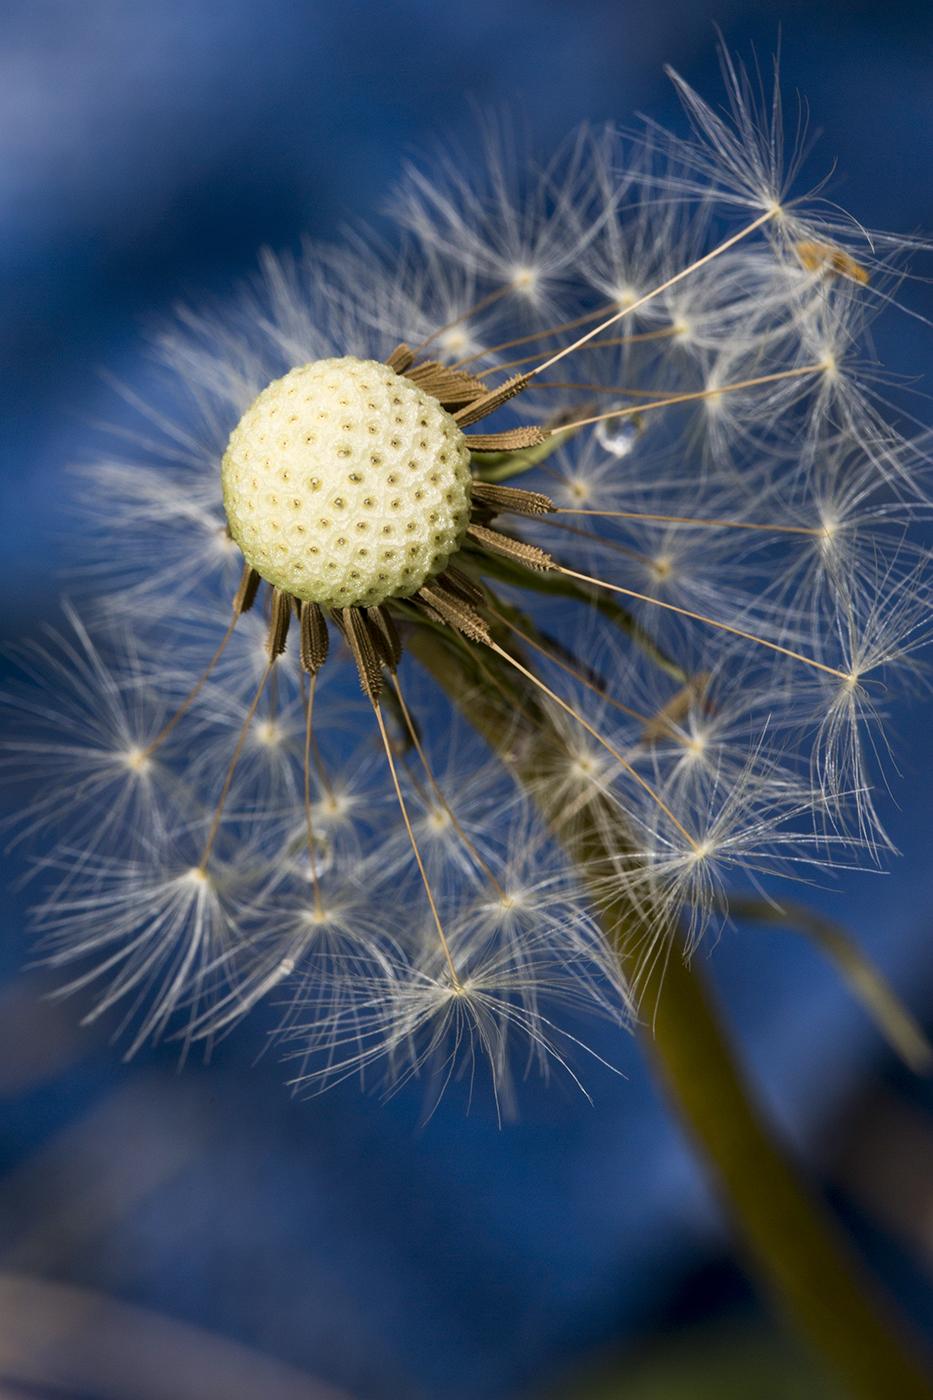 BLUE DANDY by Travers Bean